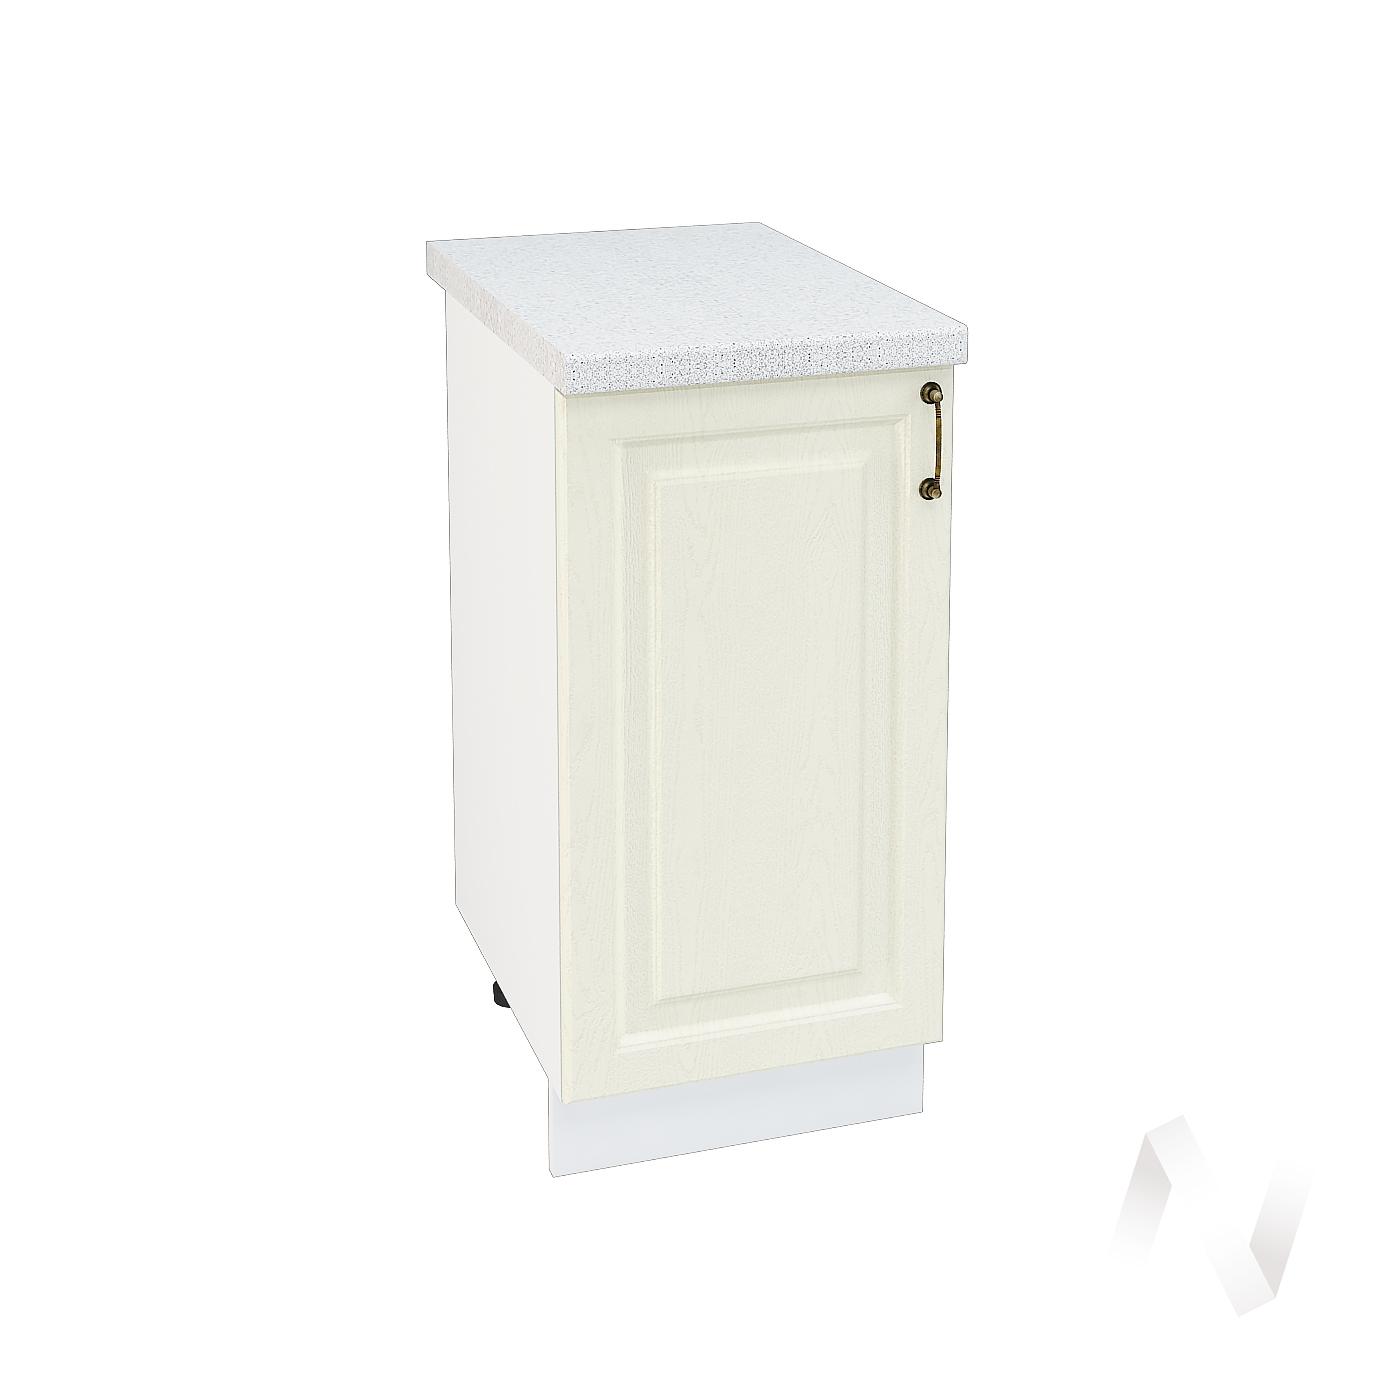 "Кухня ""Ницца"": Шкаф нижний 400, ШН 400 (Крем/корпус белый)"